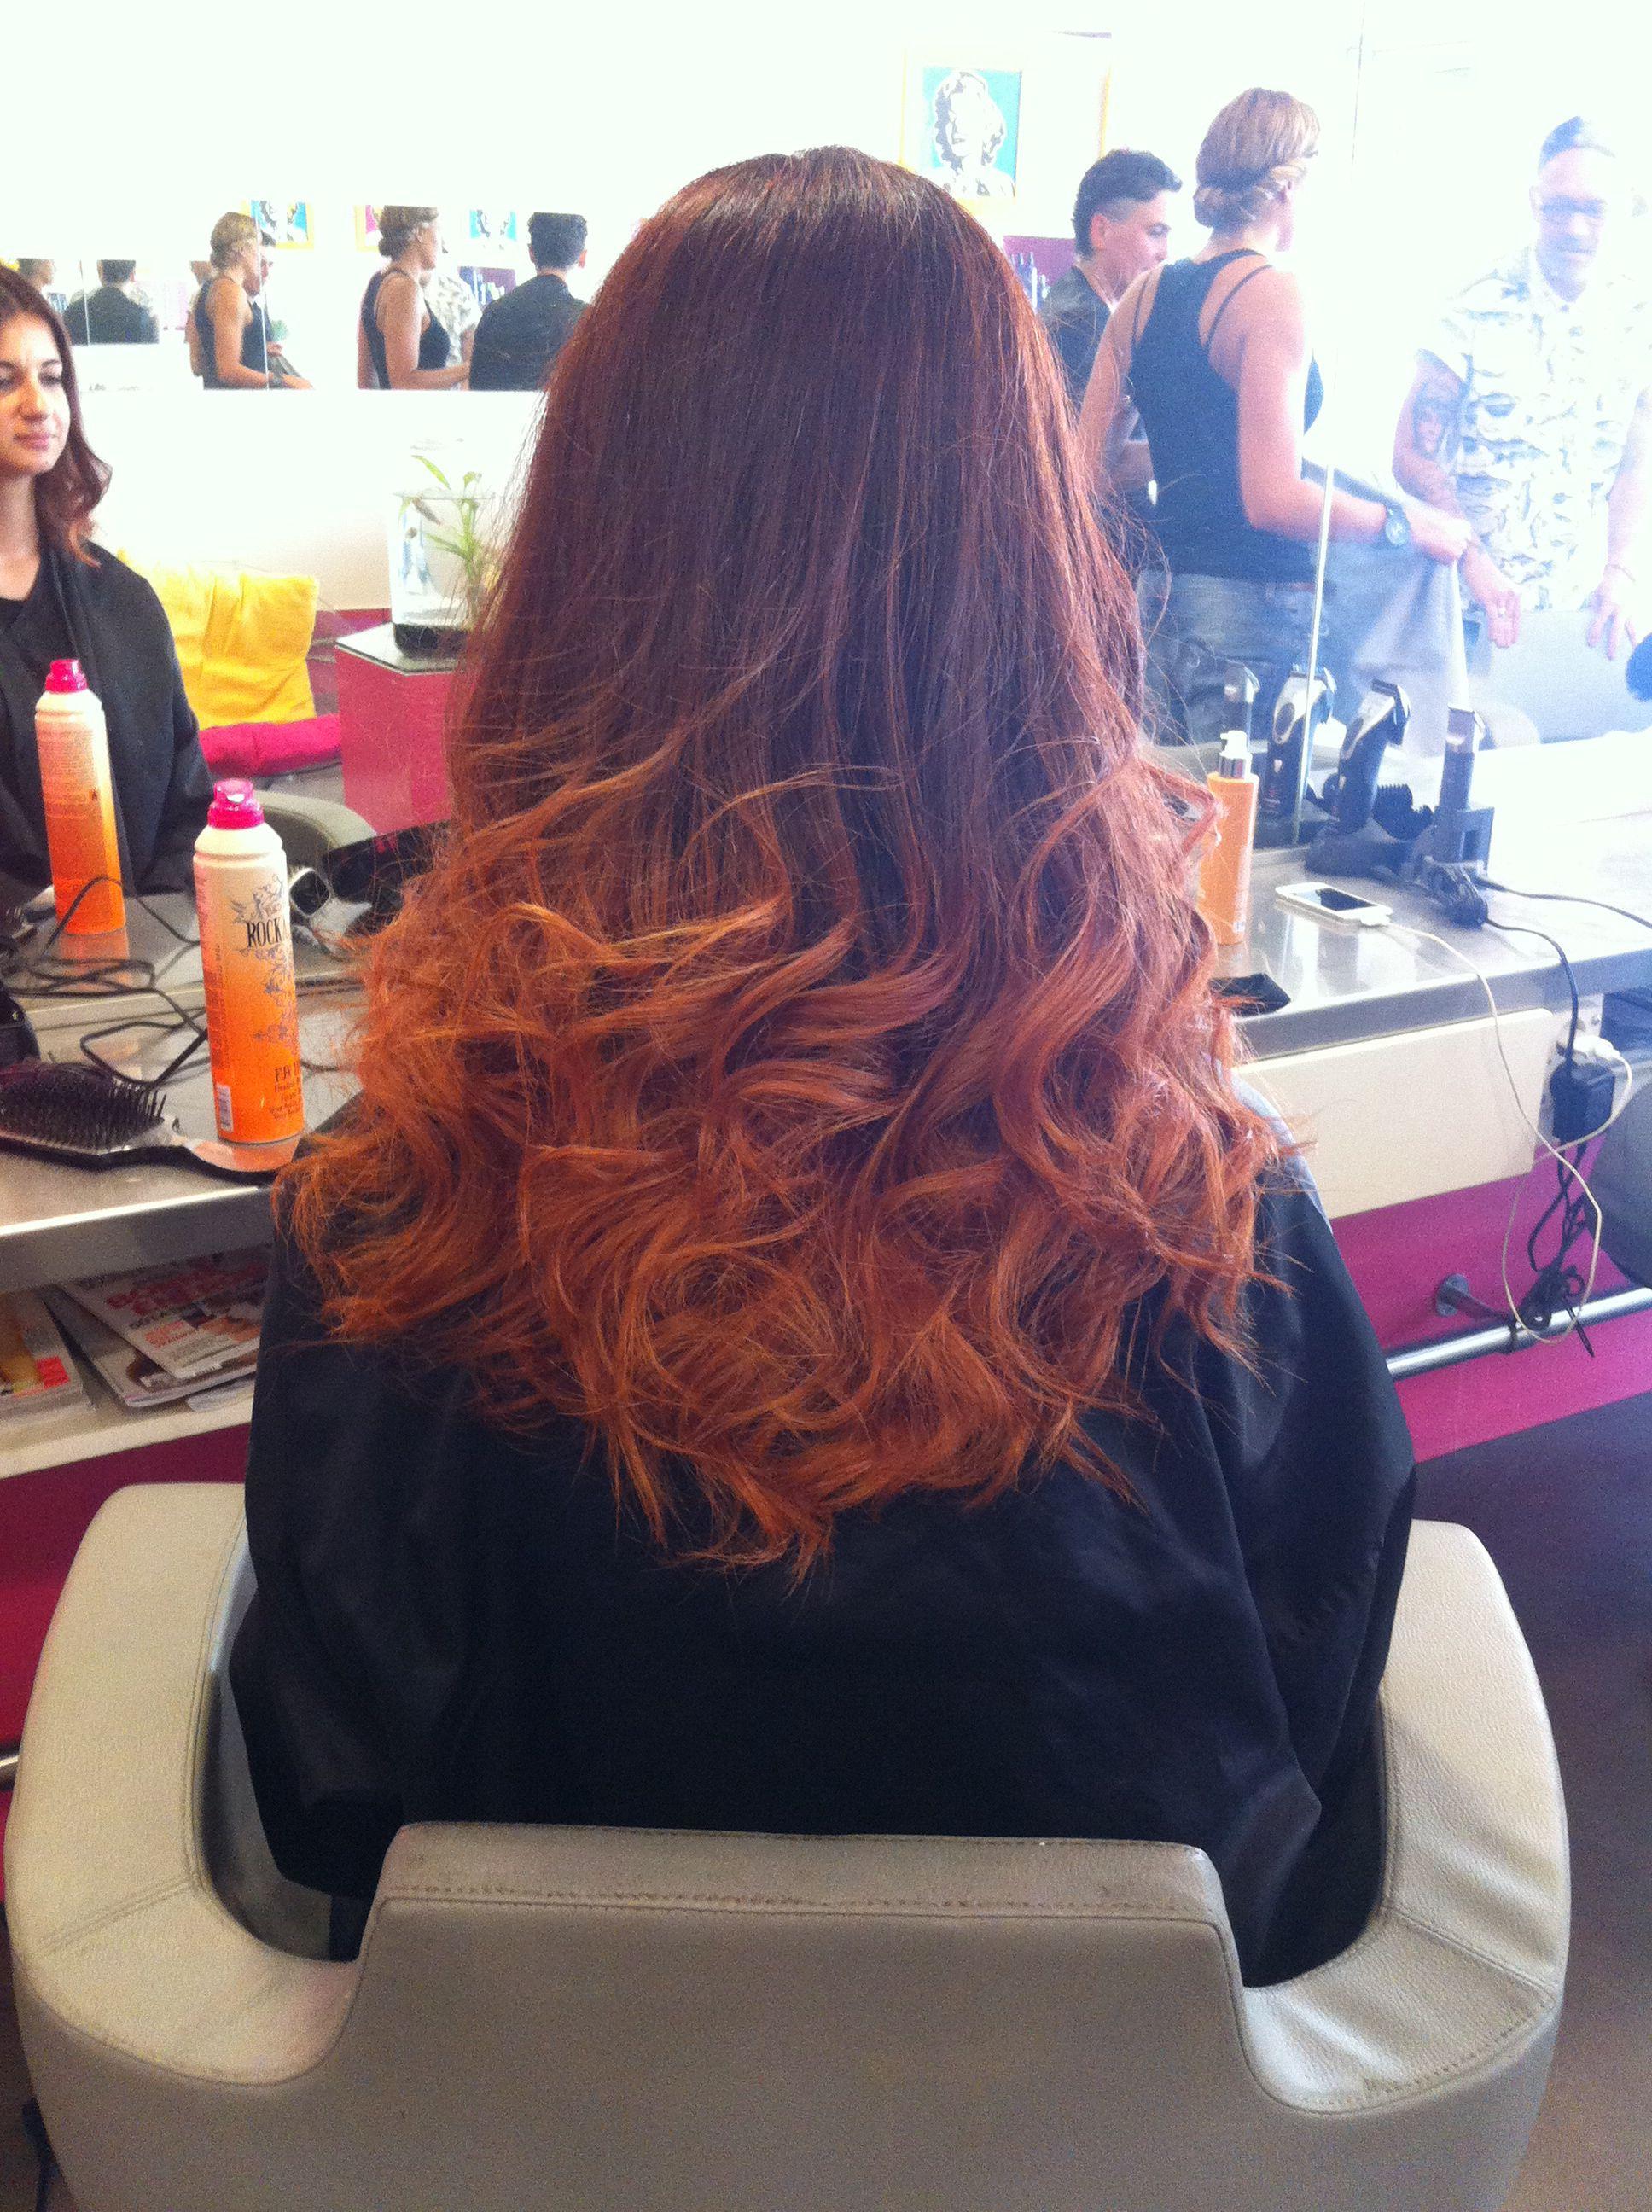 tye dye cuivr rouge ongles et coiffures hair hair styles et locks. Black Bedroom Furniture Sets. Home Design Ideas